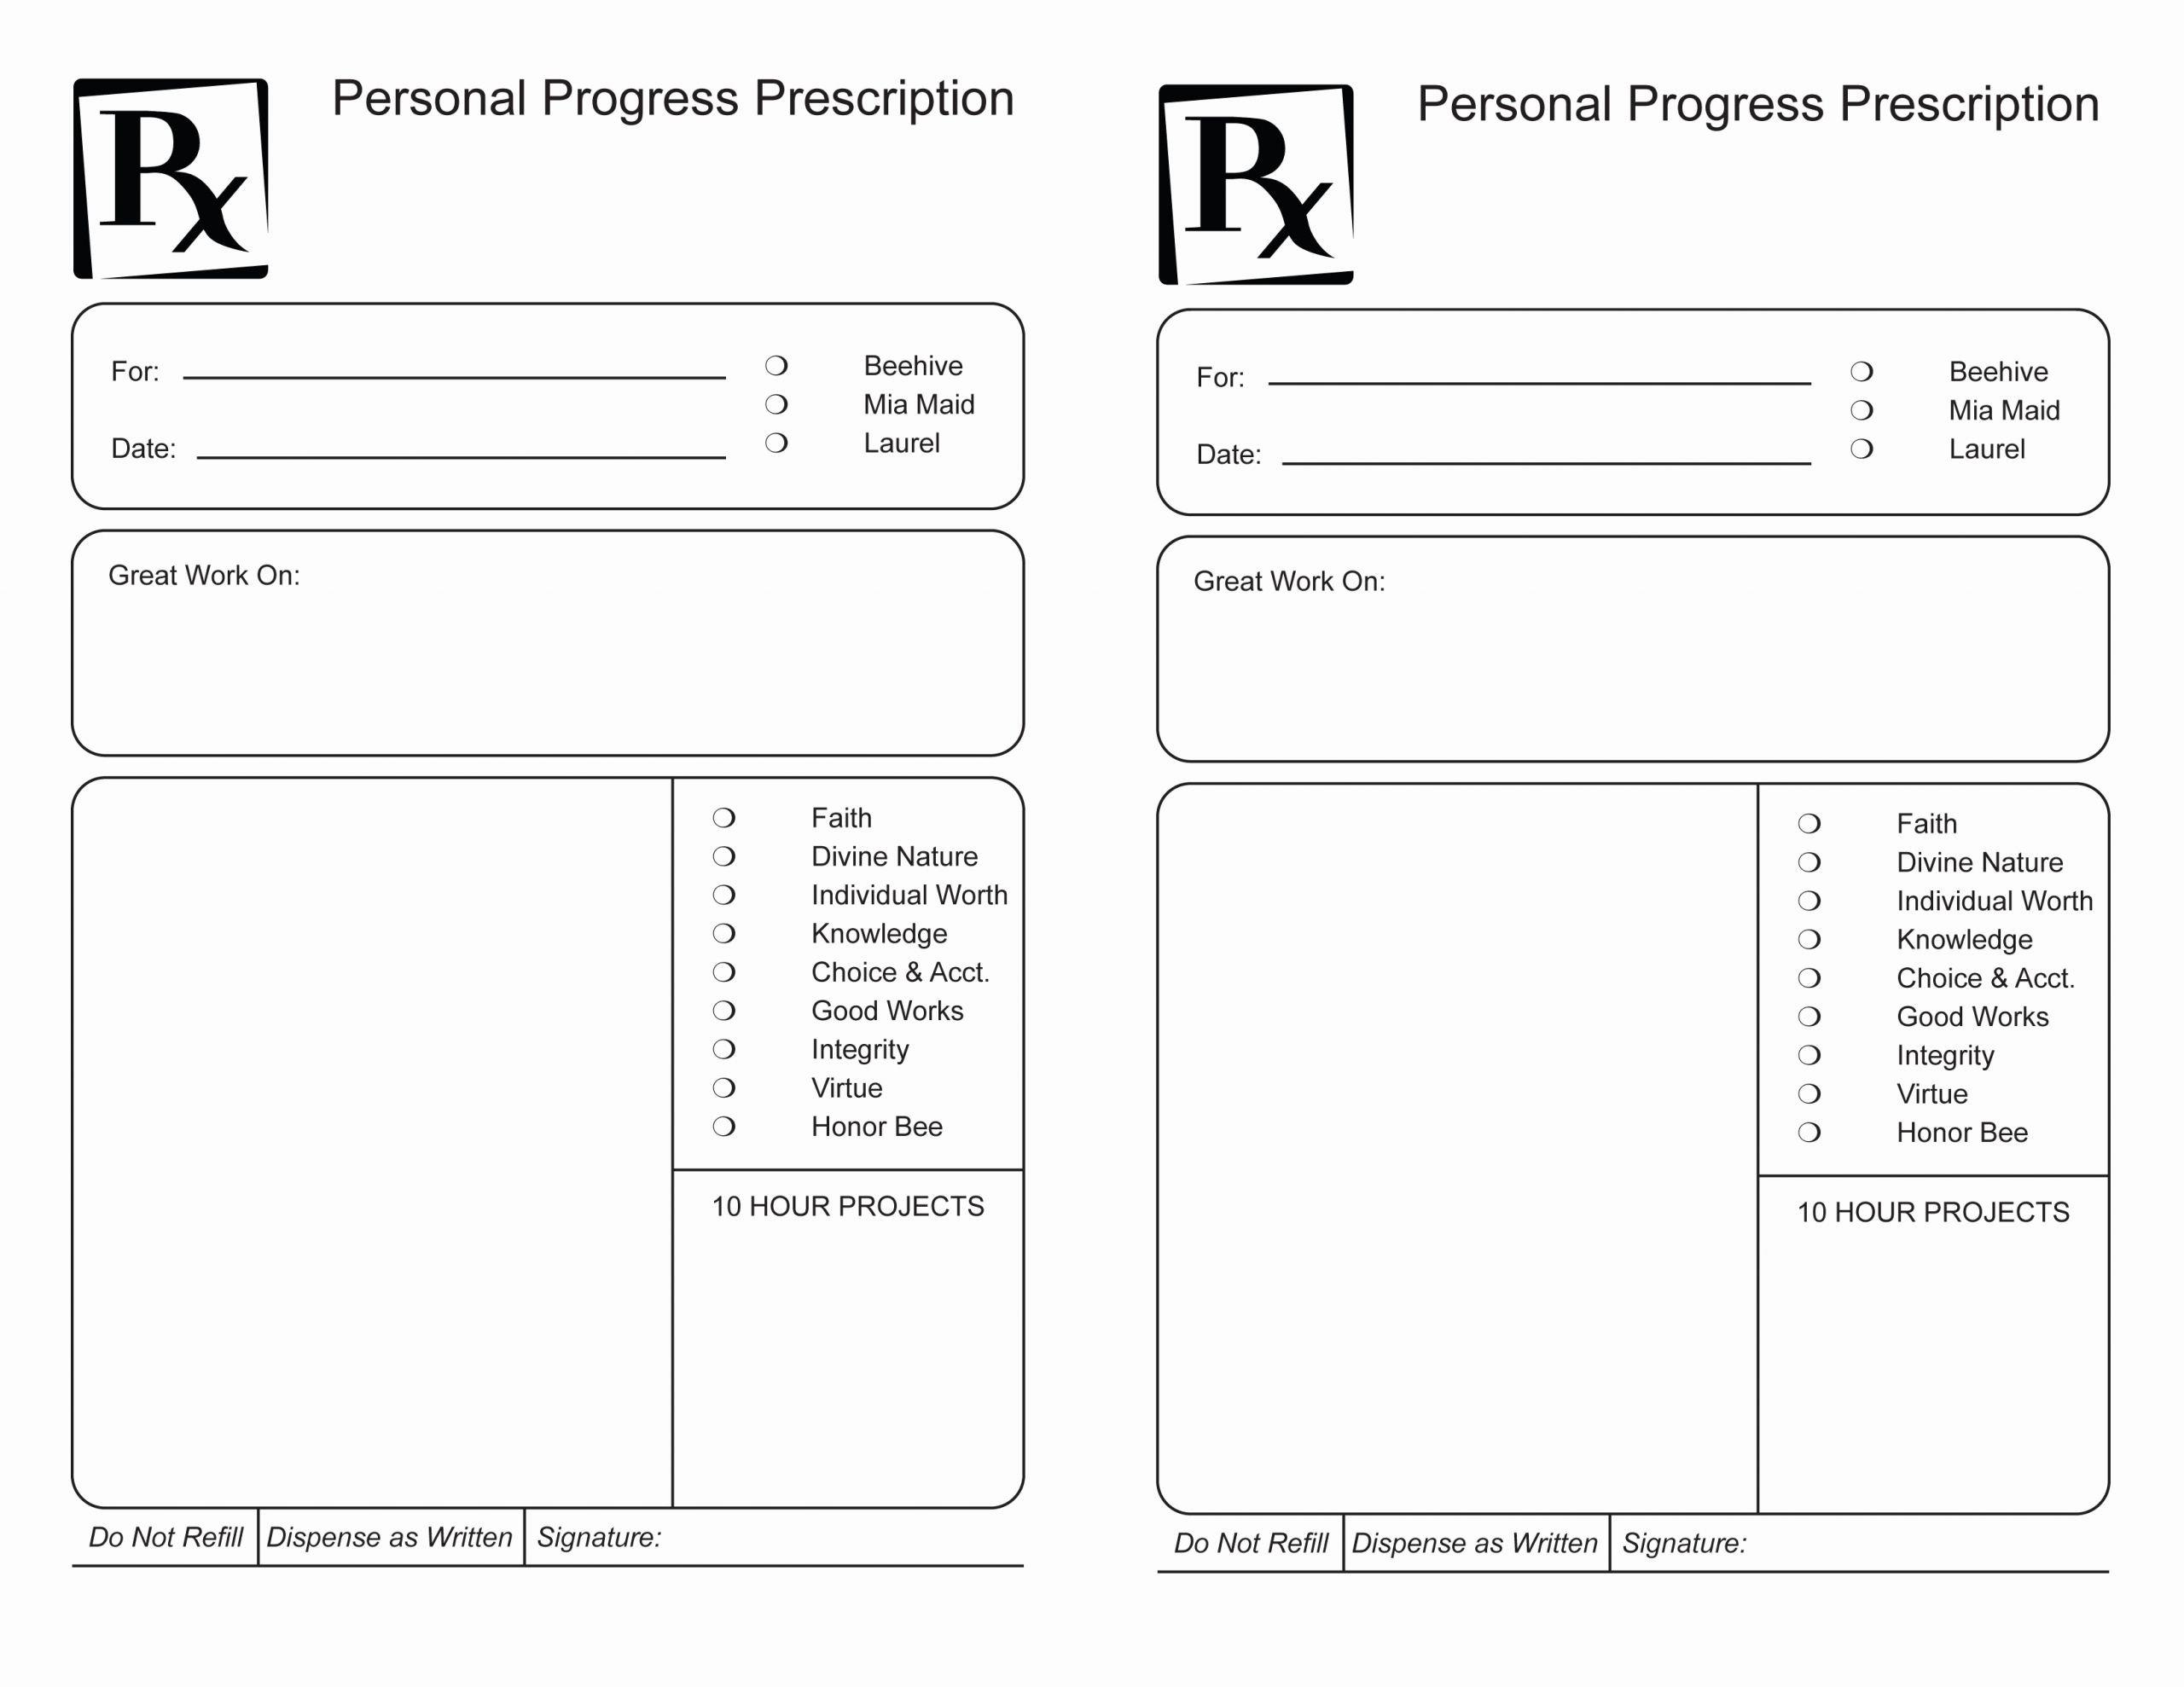 Prescription Pad Template Unique Personal Progress Prescription Pad – the Gospel Home